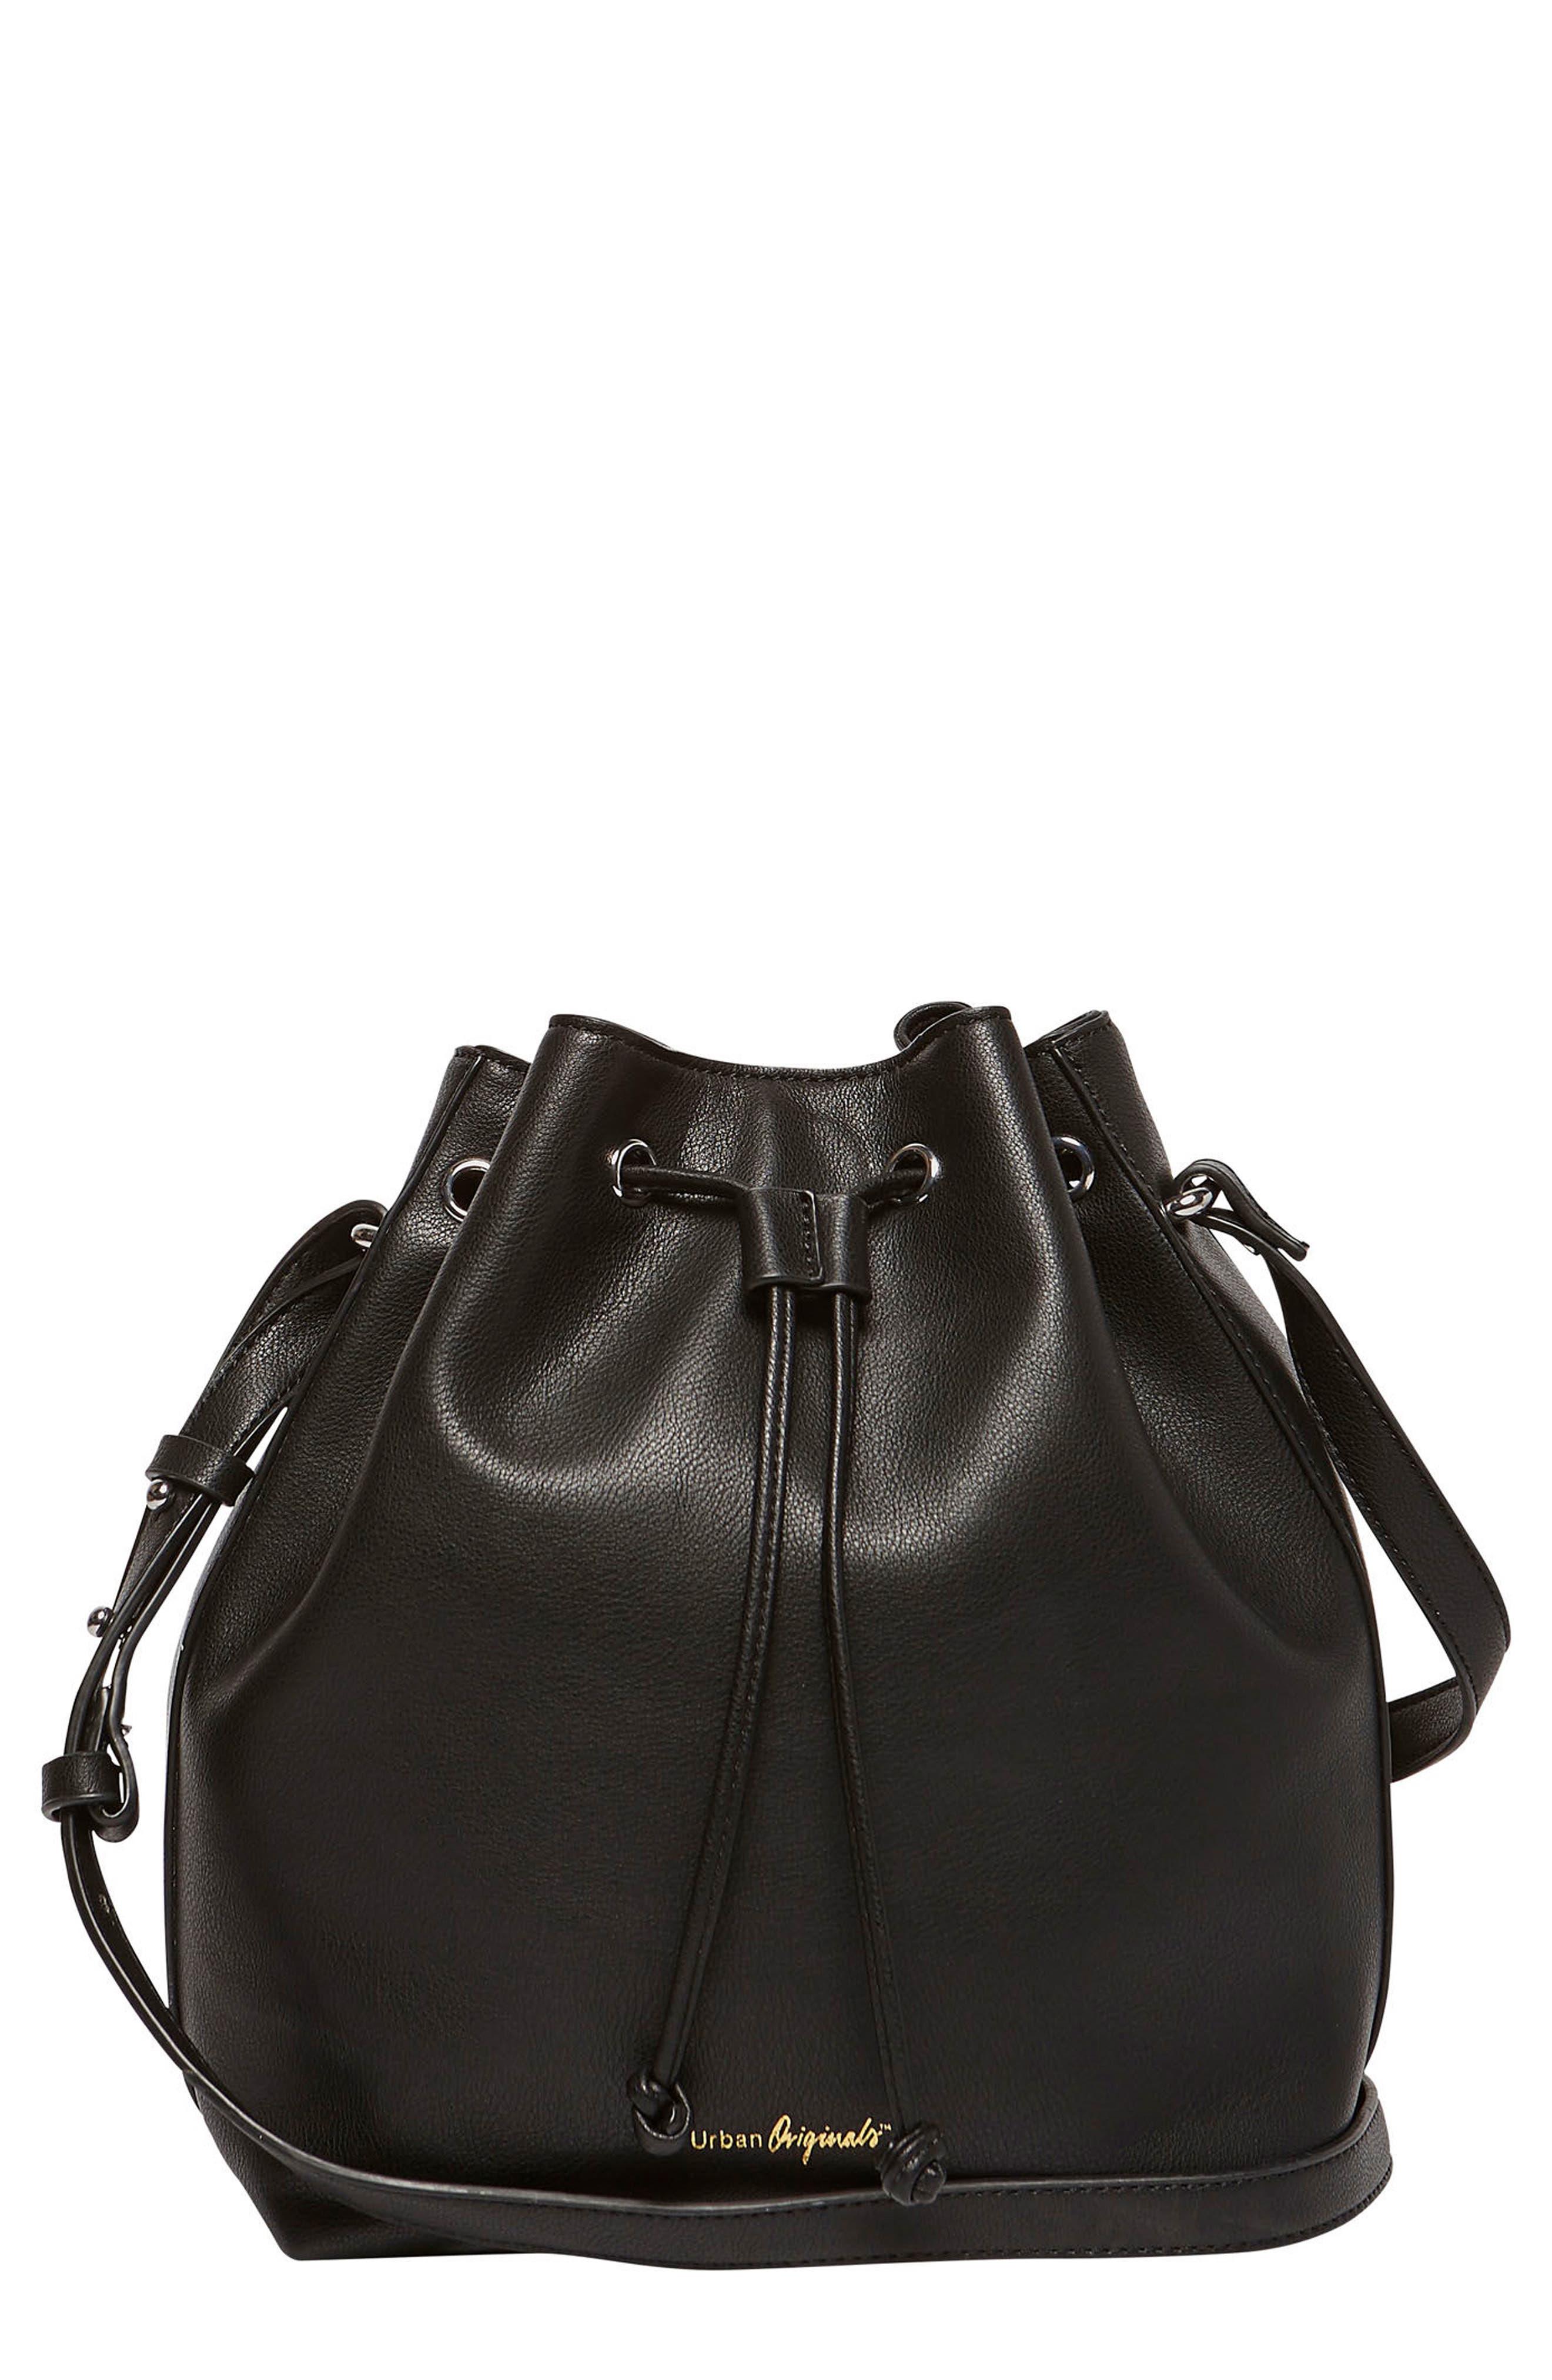 Take Me Home Vegan Leather Bag,                             Main thumbnail 1, color,                             001